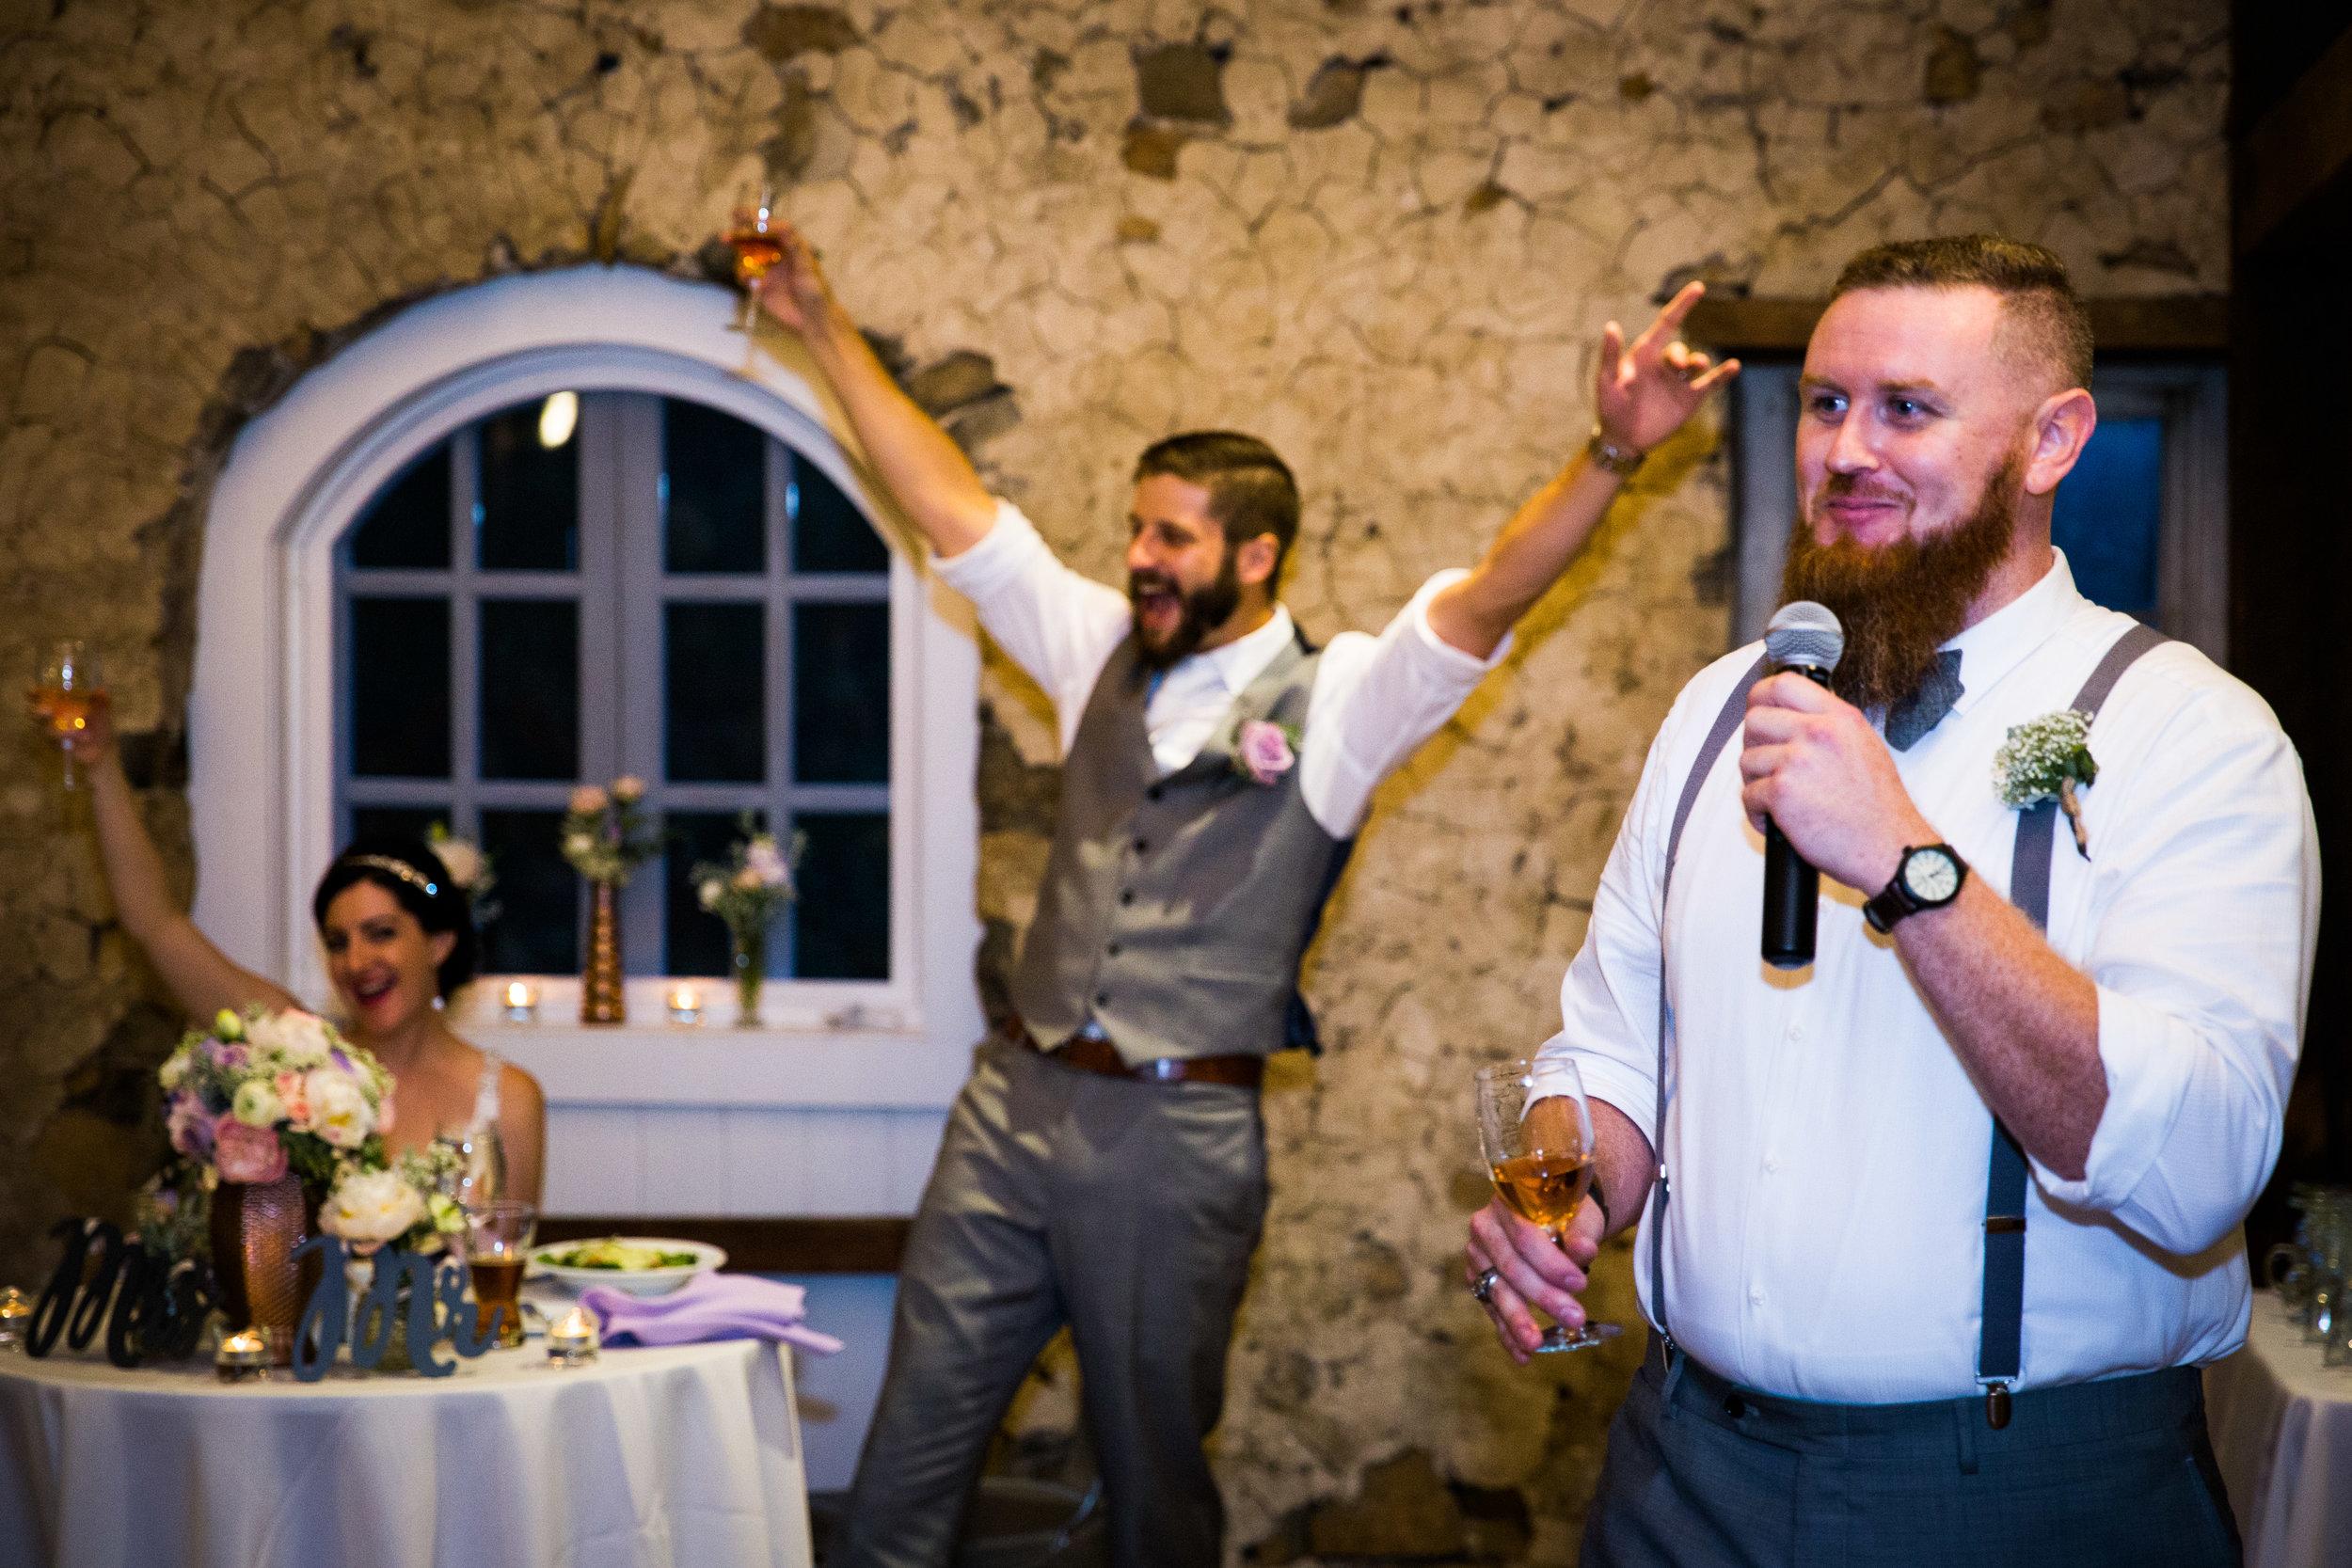 TYLER ARBORETUM WEDDING PHOTOGRAPHY LOVESTRUCK PICTURES-089.jpg